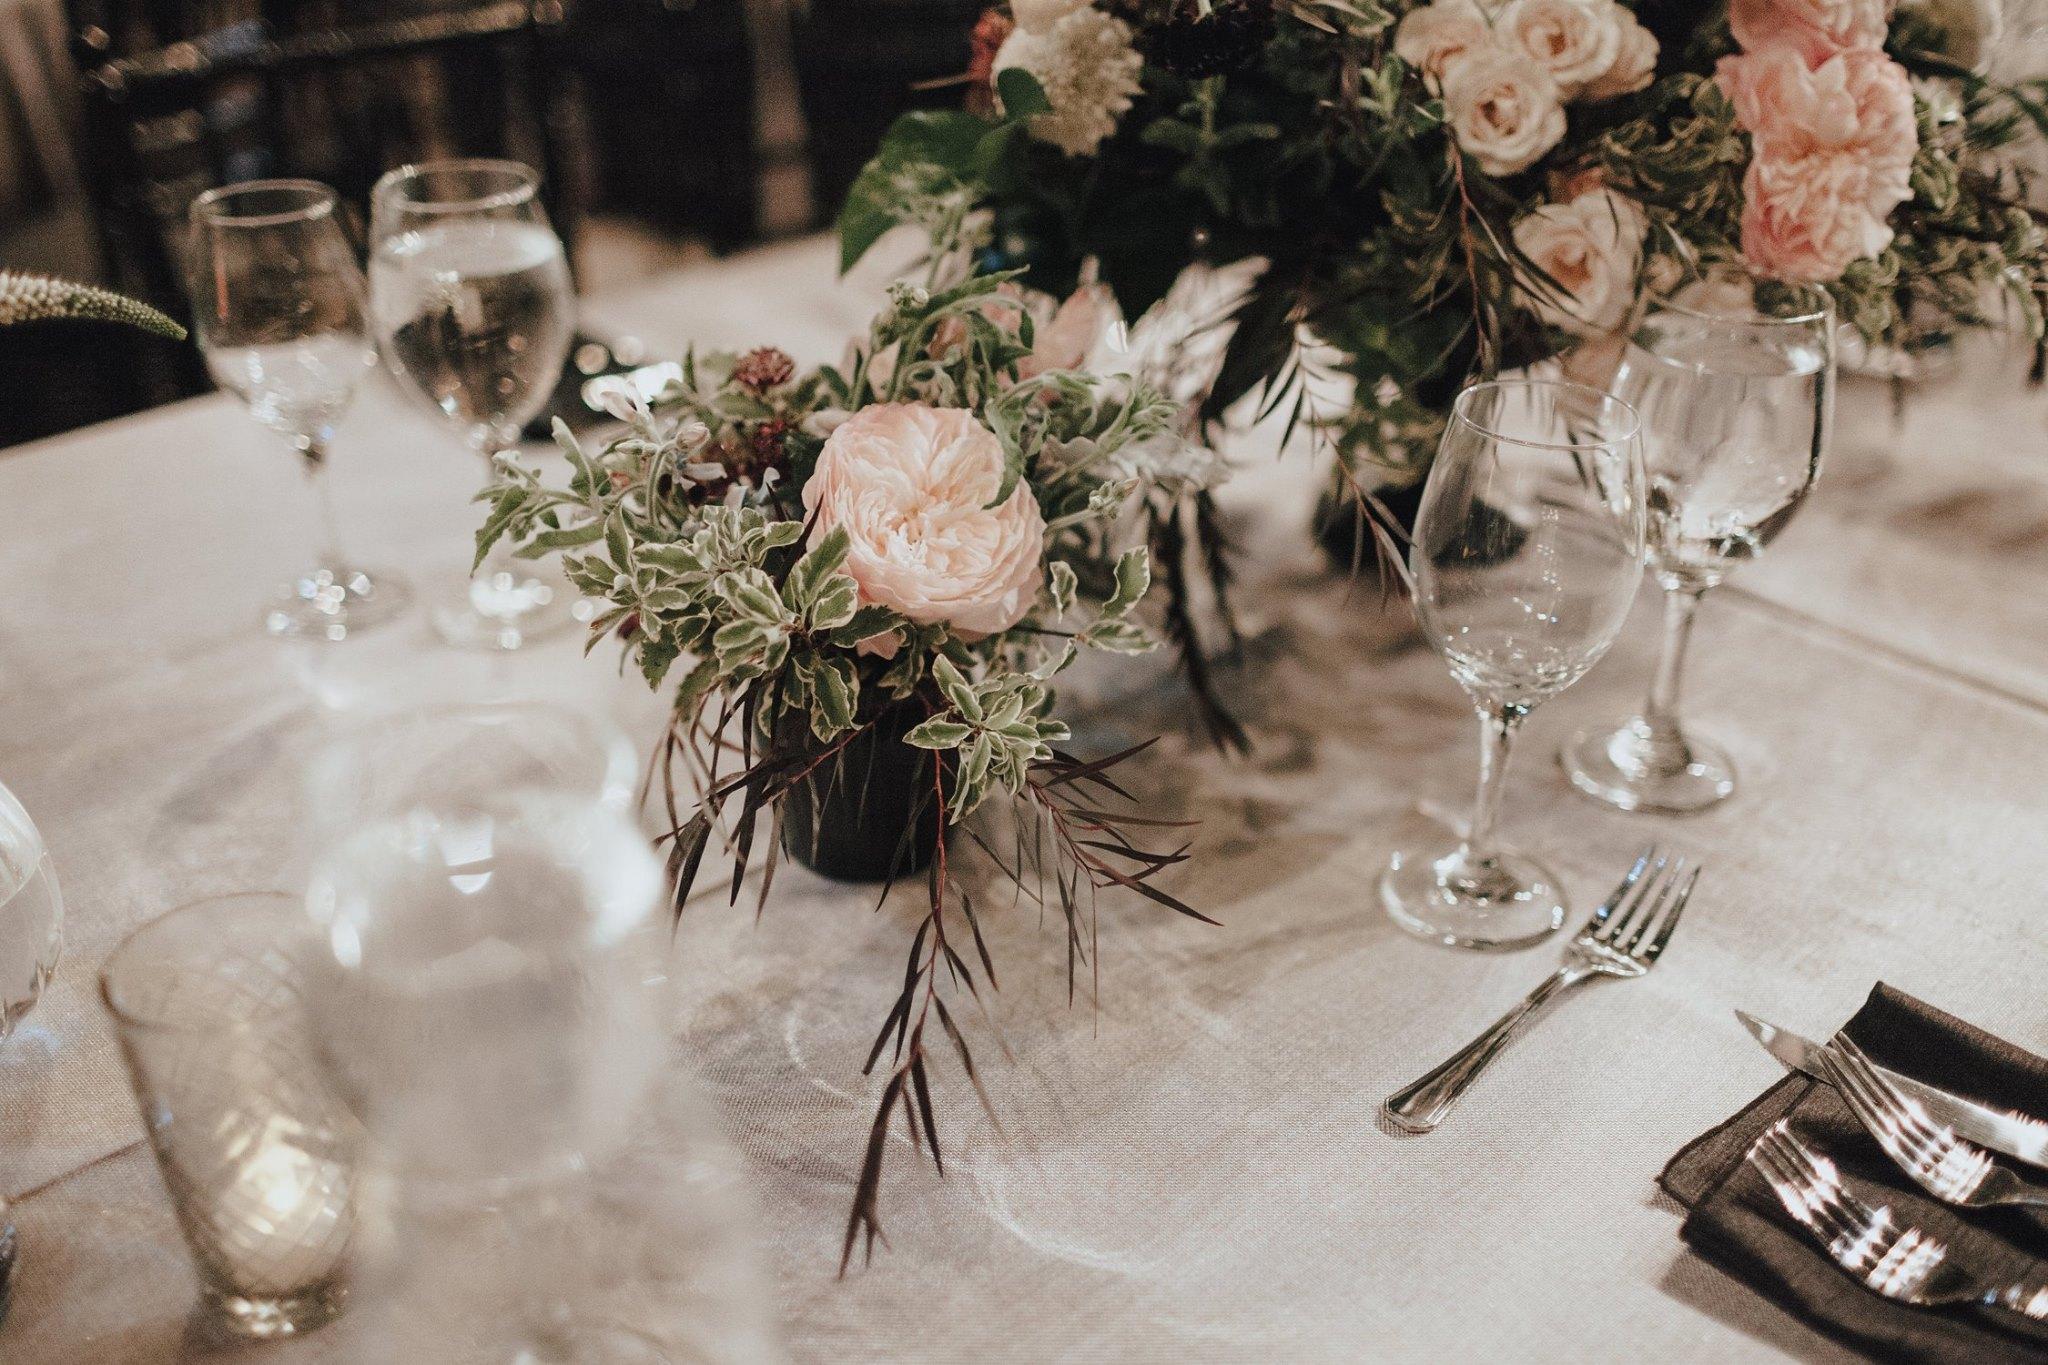 Catering Luxury Destination Wedding in Miami 17.jpg